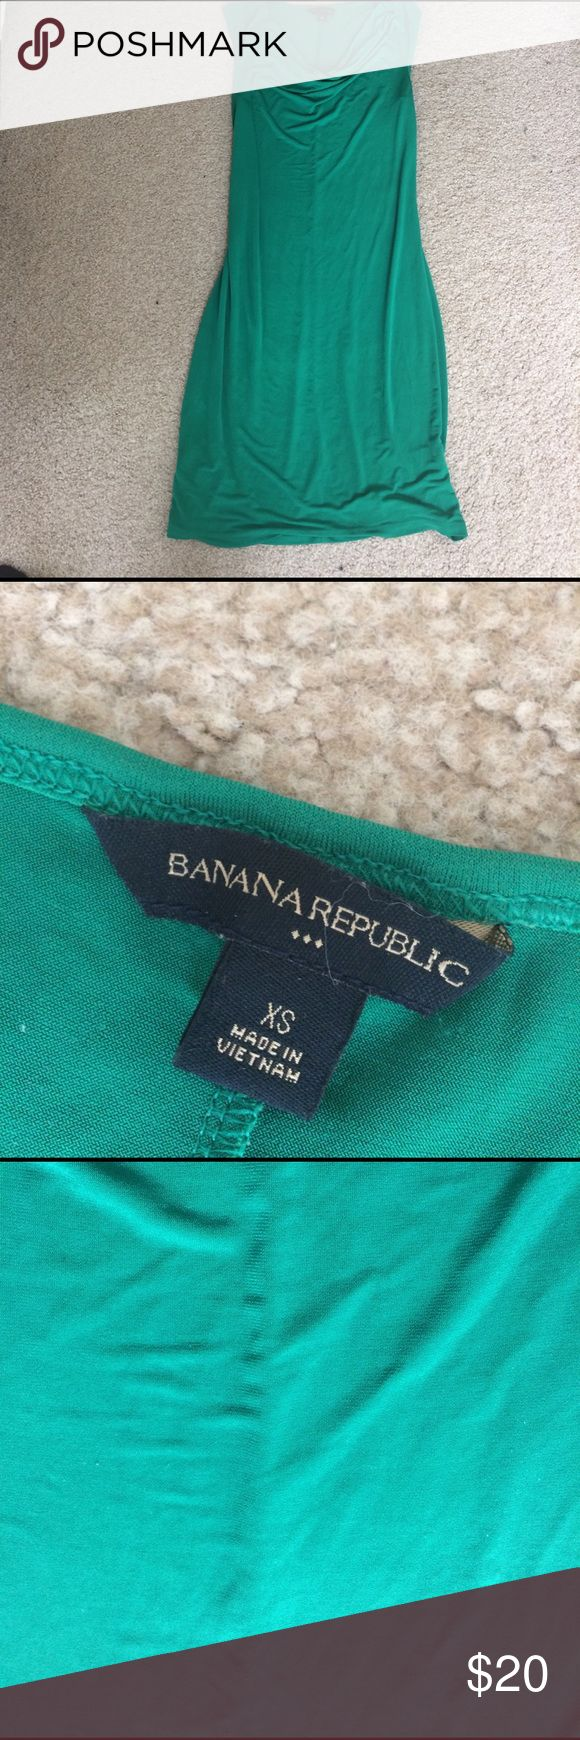 💐🌼 HELLO SPRING 🌼💐 Banana Republic Kelly green dress XS Banana Republic Dresses